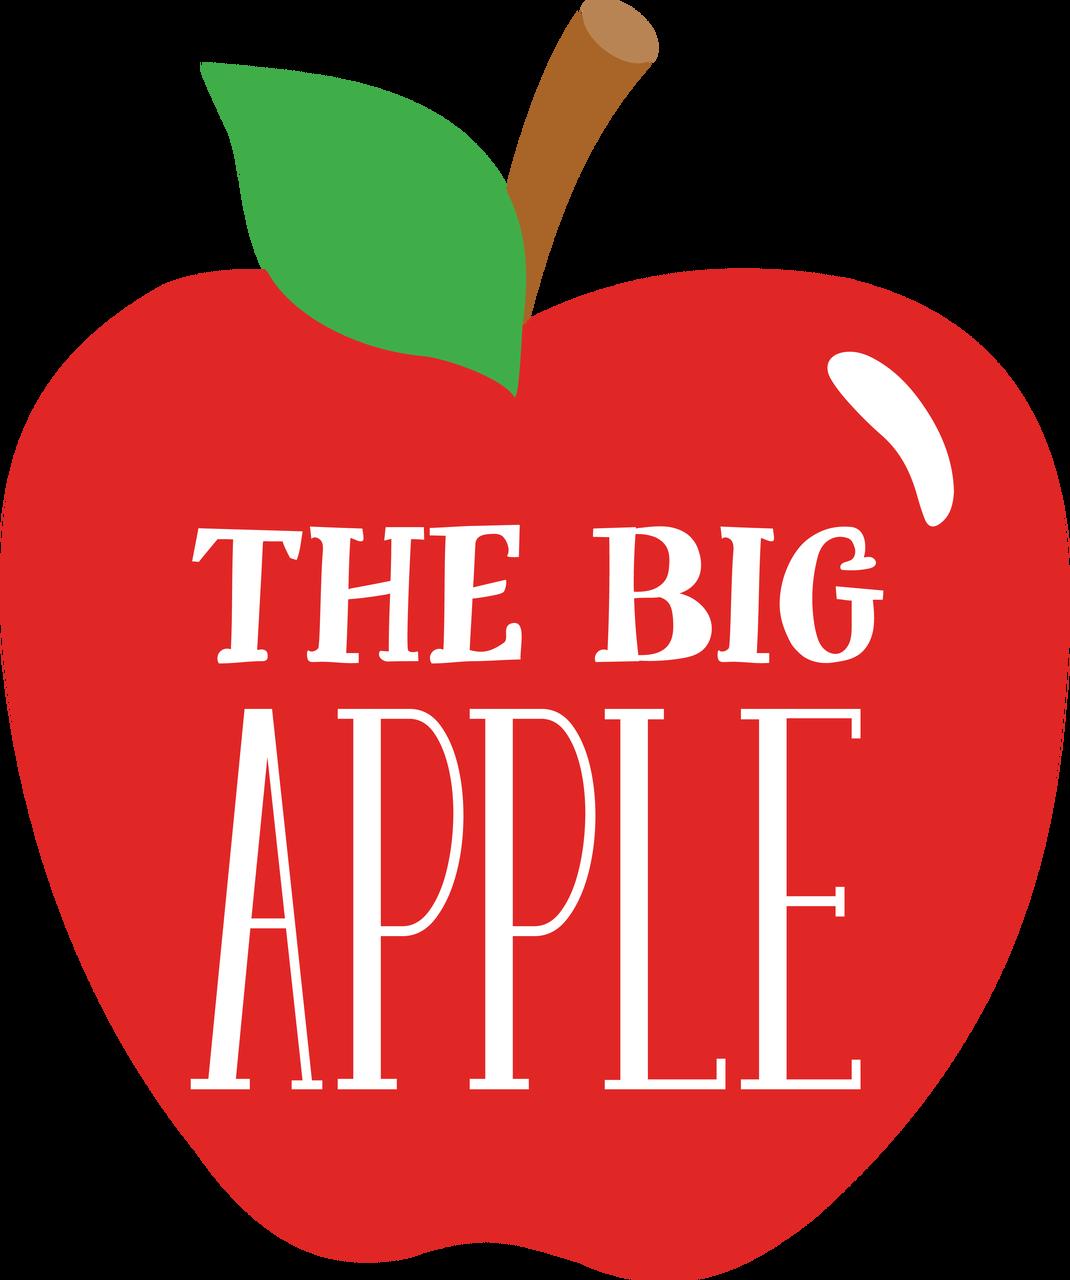 The Big Apple SVG Cut File